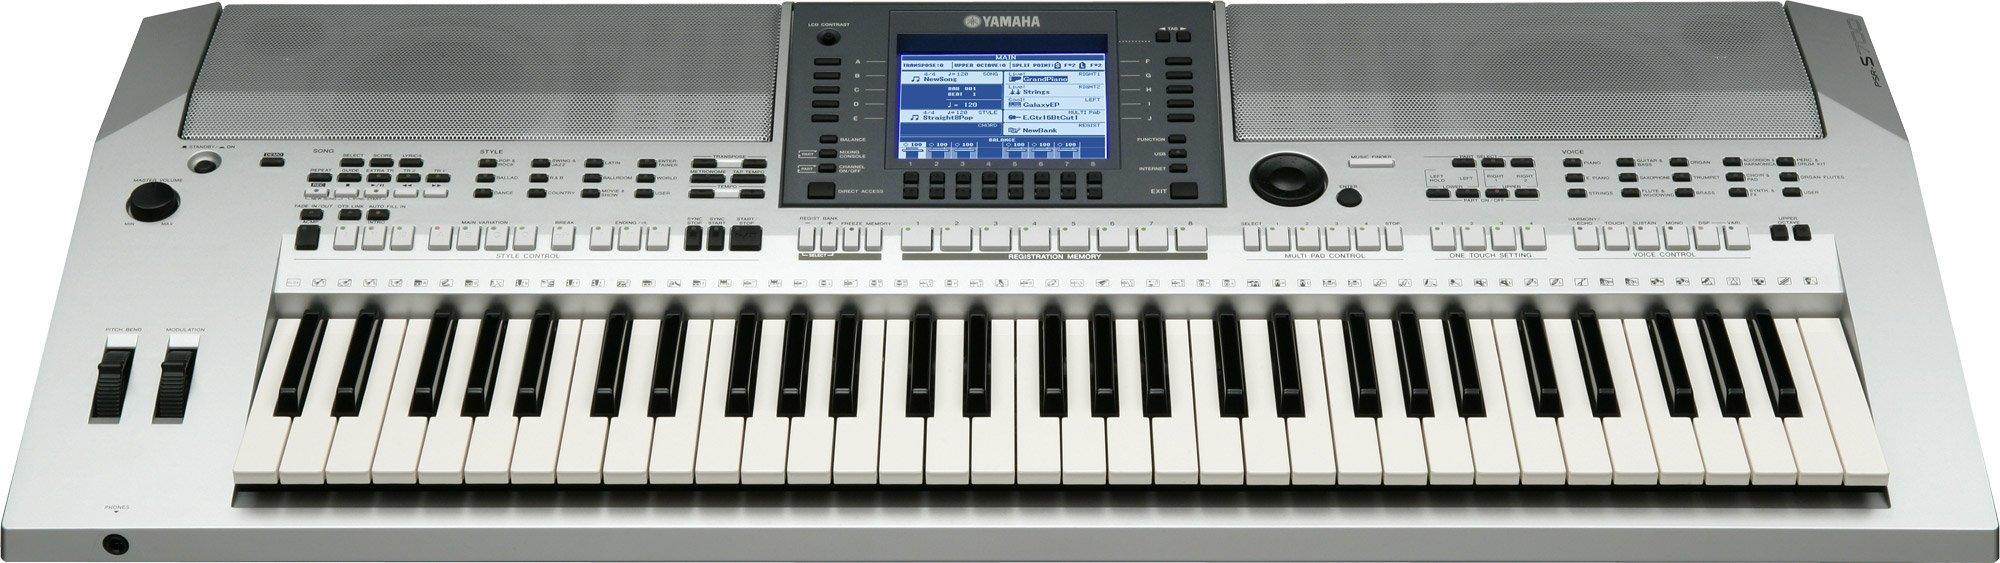 How To Play Mp On Yamaha Keyboard